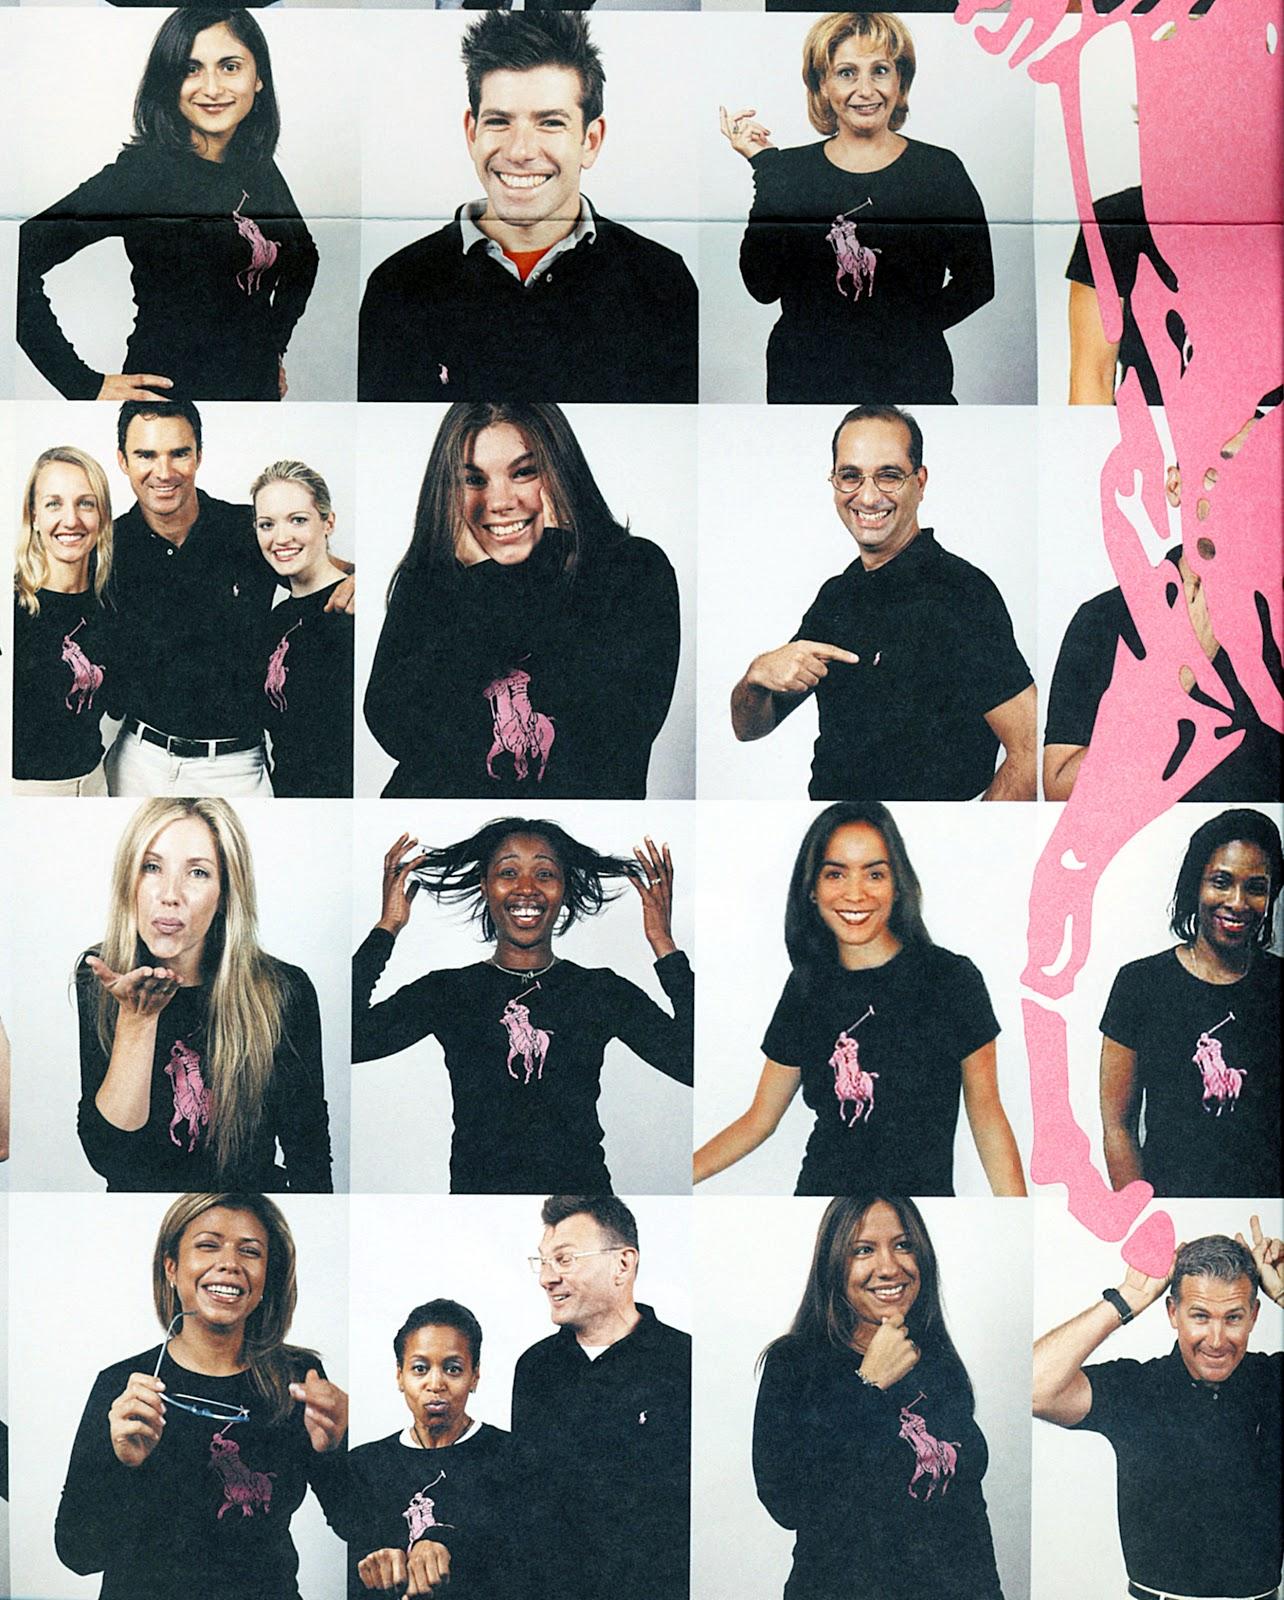 http://1.bp.blogspot.com/-FdJ749LWyRs/UGYNML6rVSI/AAAAAAAACFc/sBxyXMMxigg/s1600/Pink+Pony+2.jpeg